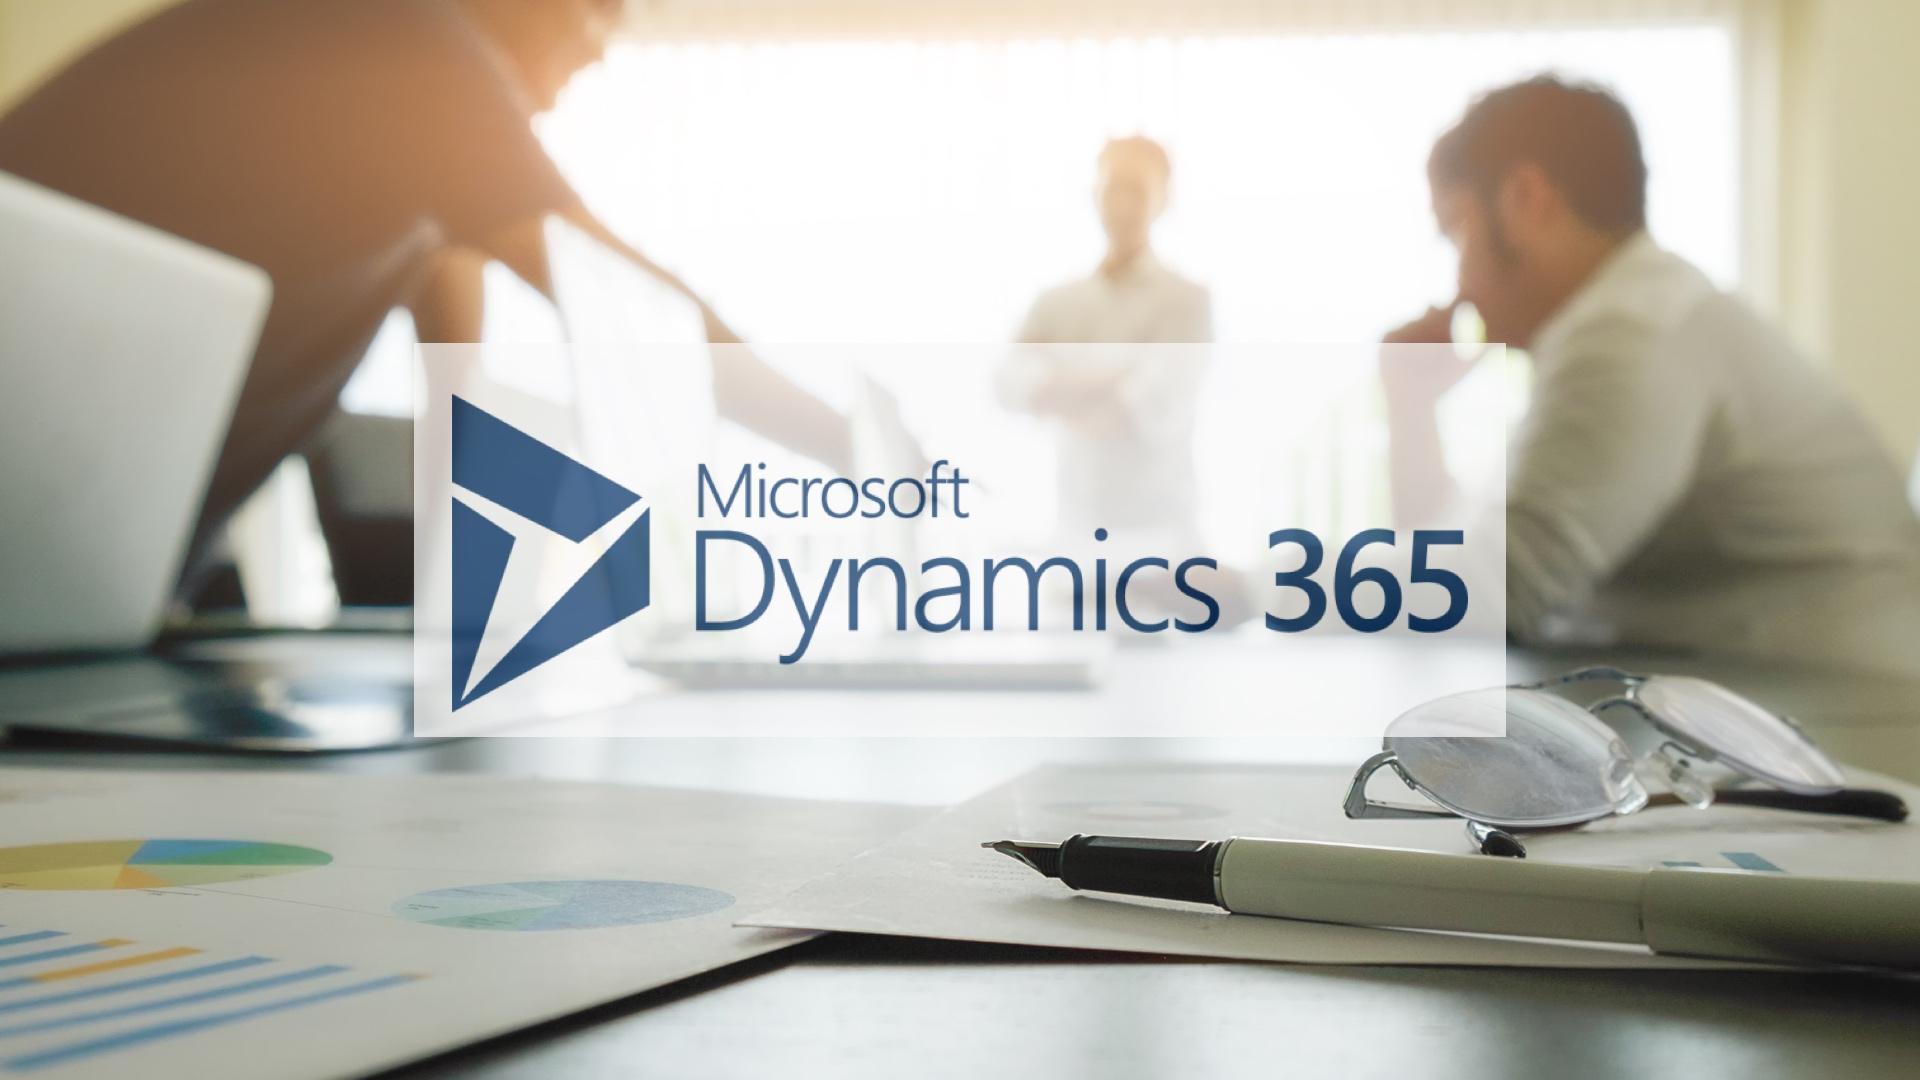 Microsoft Dynamics 365 ap automation